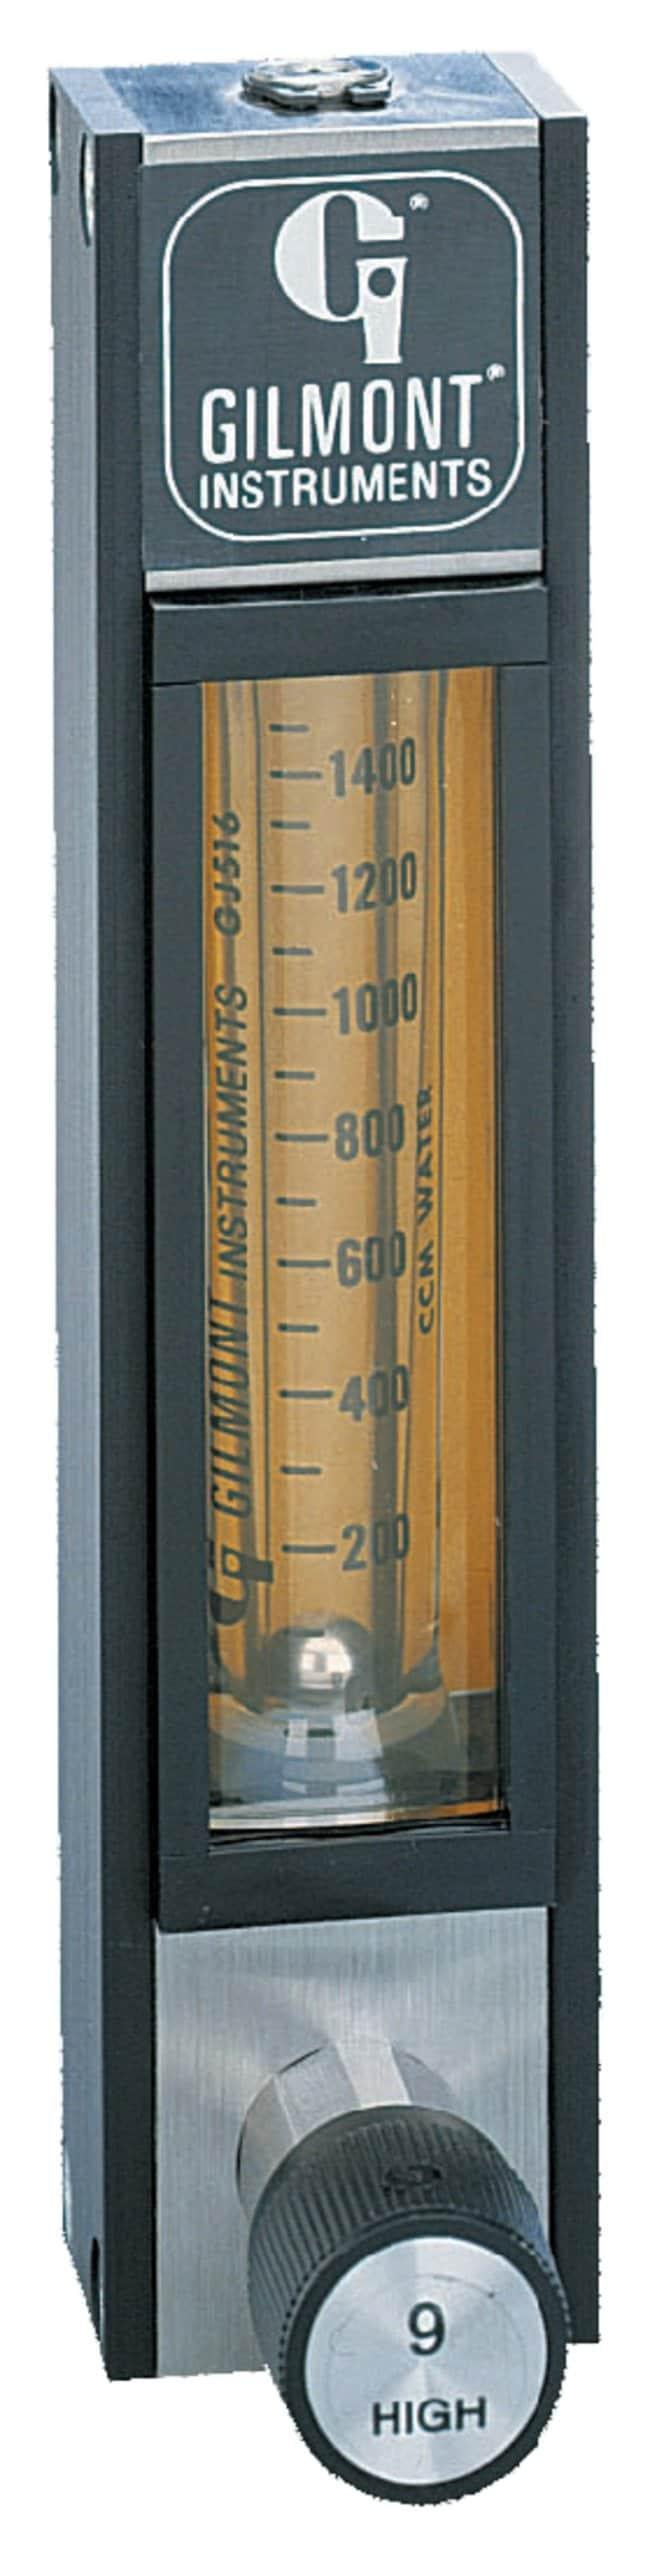 Masterflex Industrial Correlated Aluminum Flowmeter Flowmeter; 65mm; Aluminum,